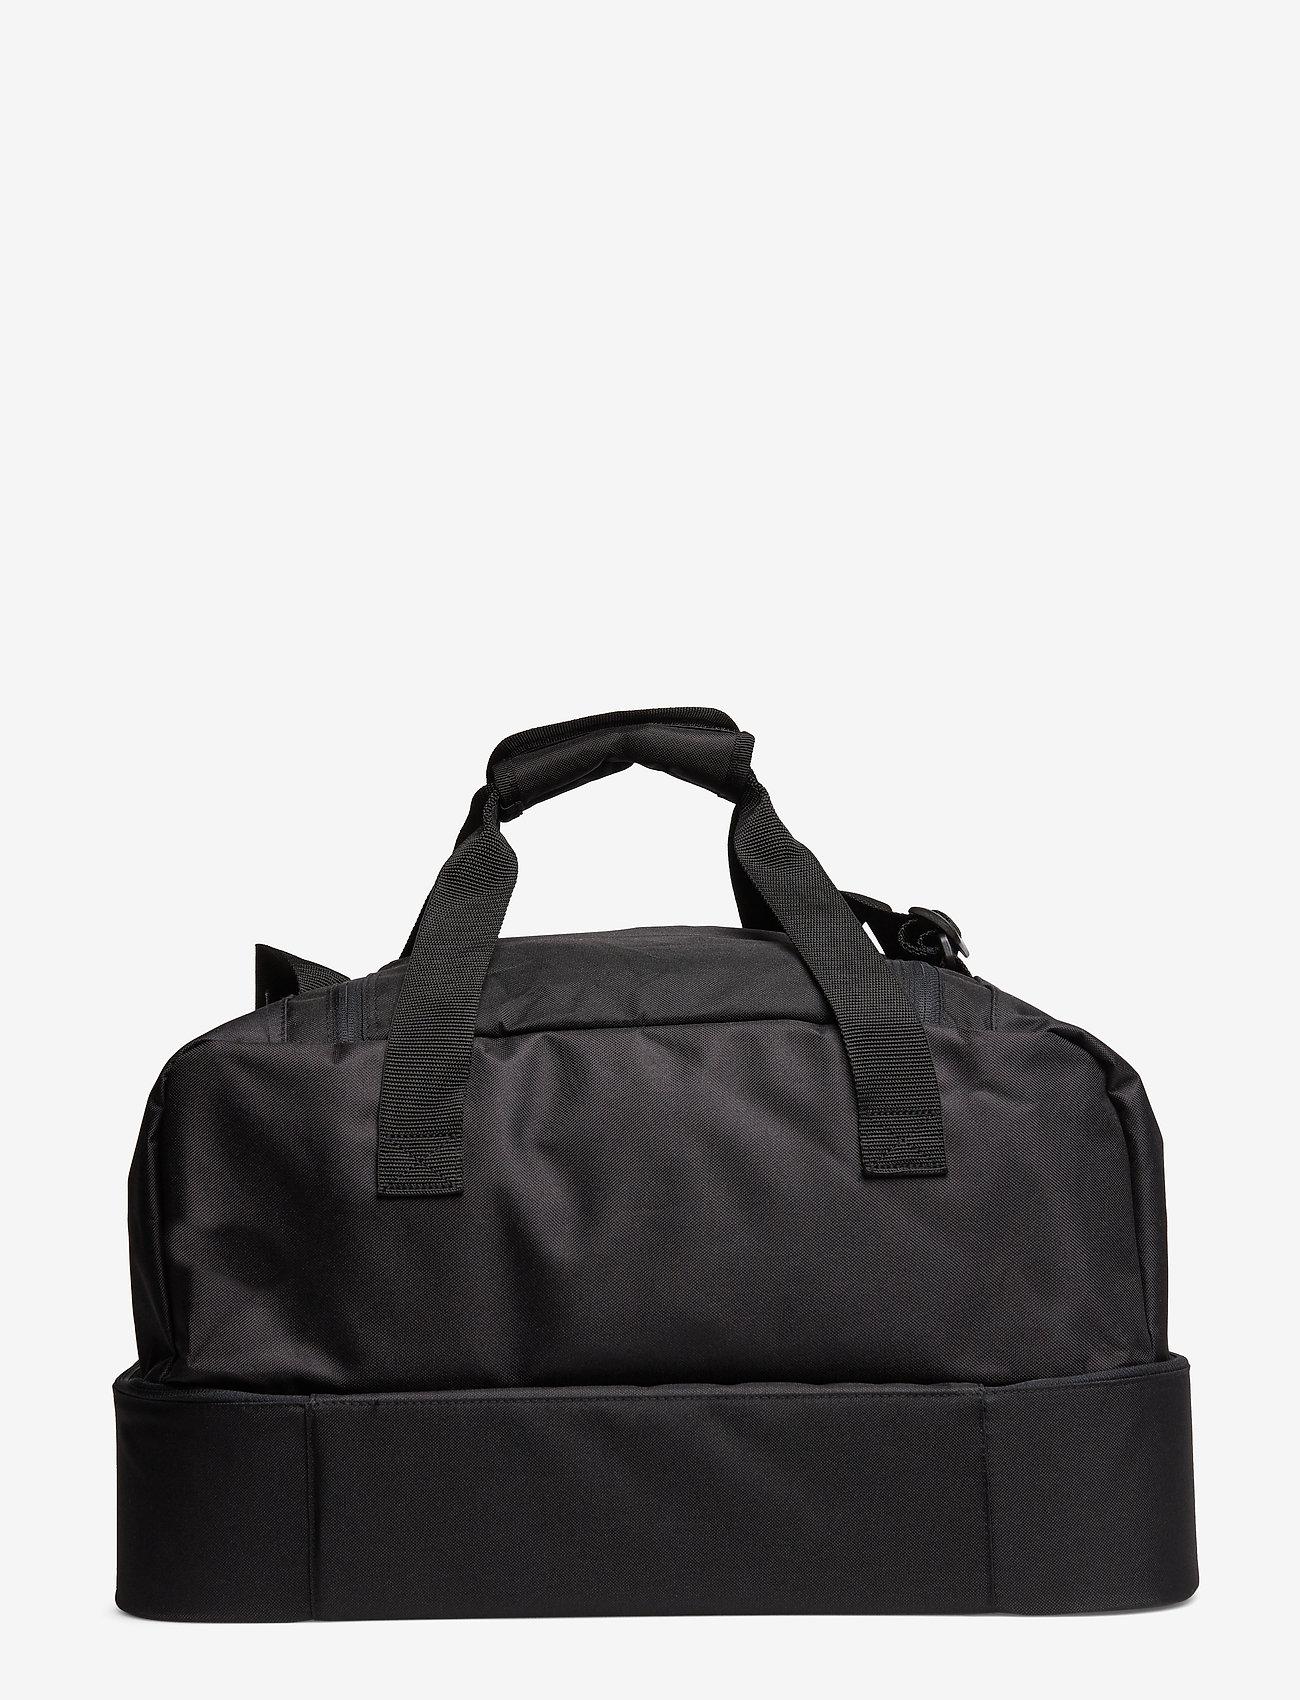 adidas Performance - TIRO DU BC S - torby na siłownię - black/white - 1